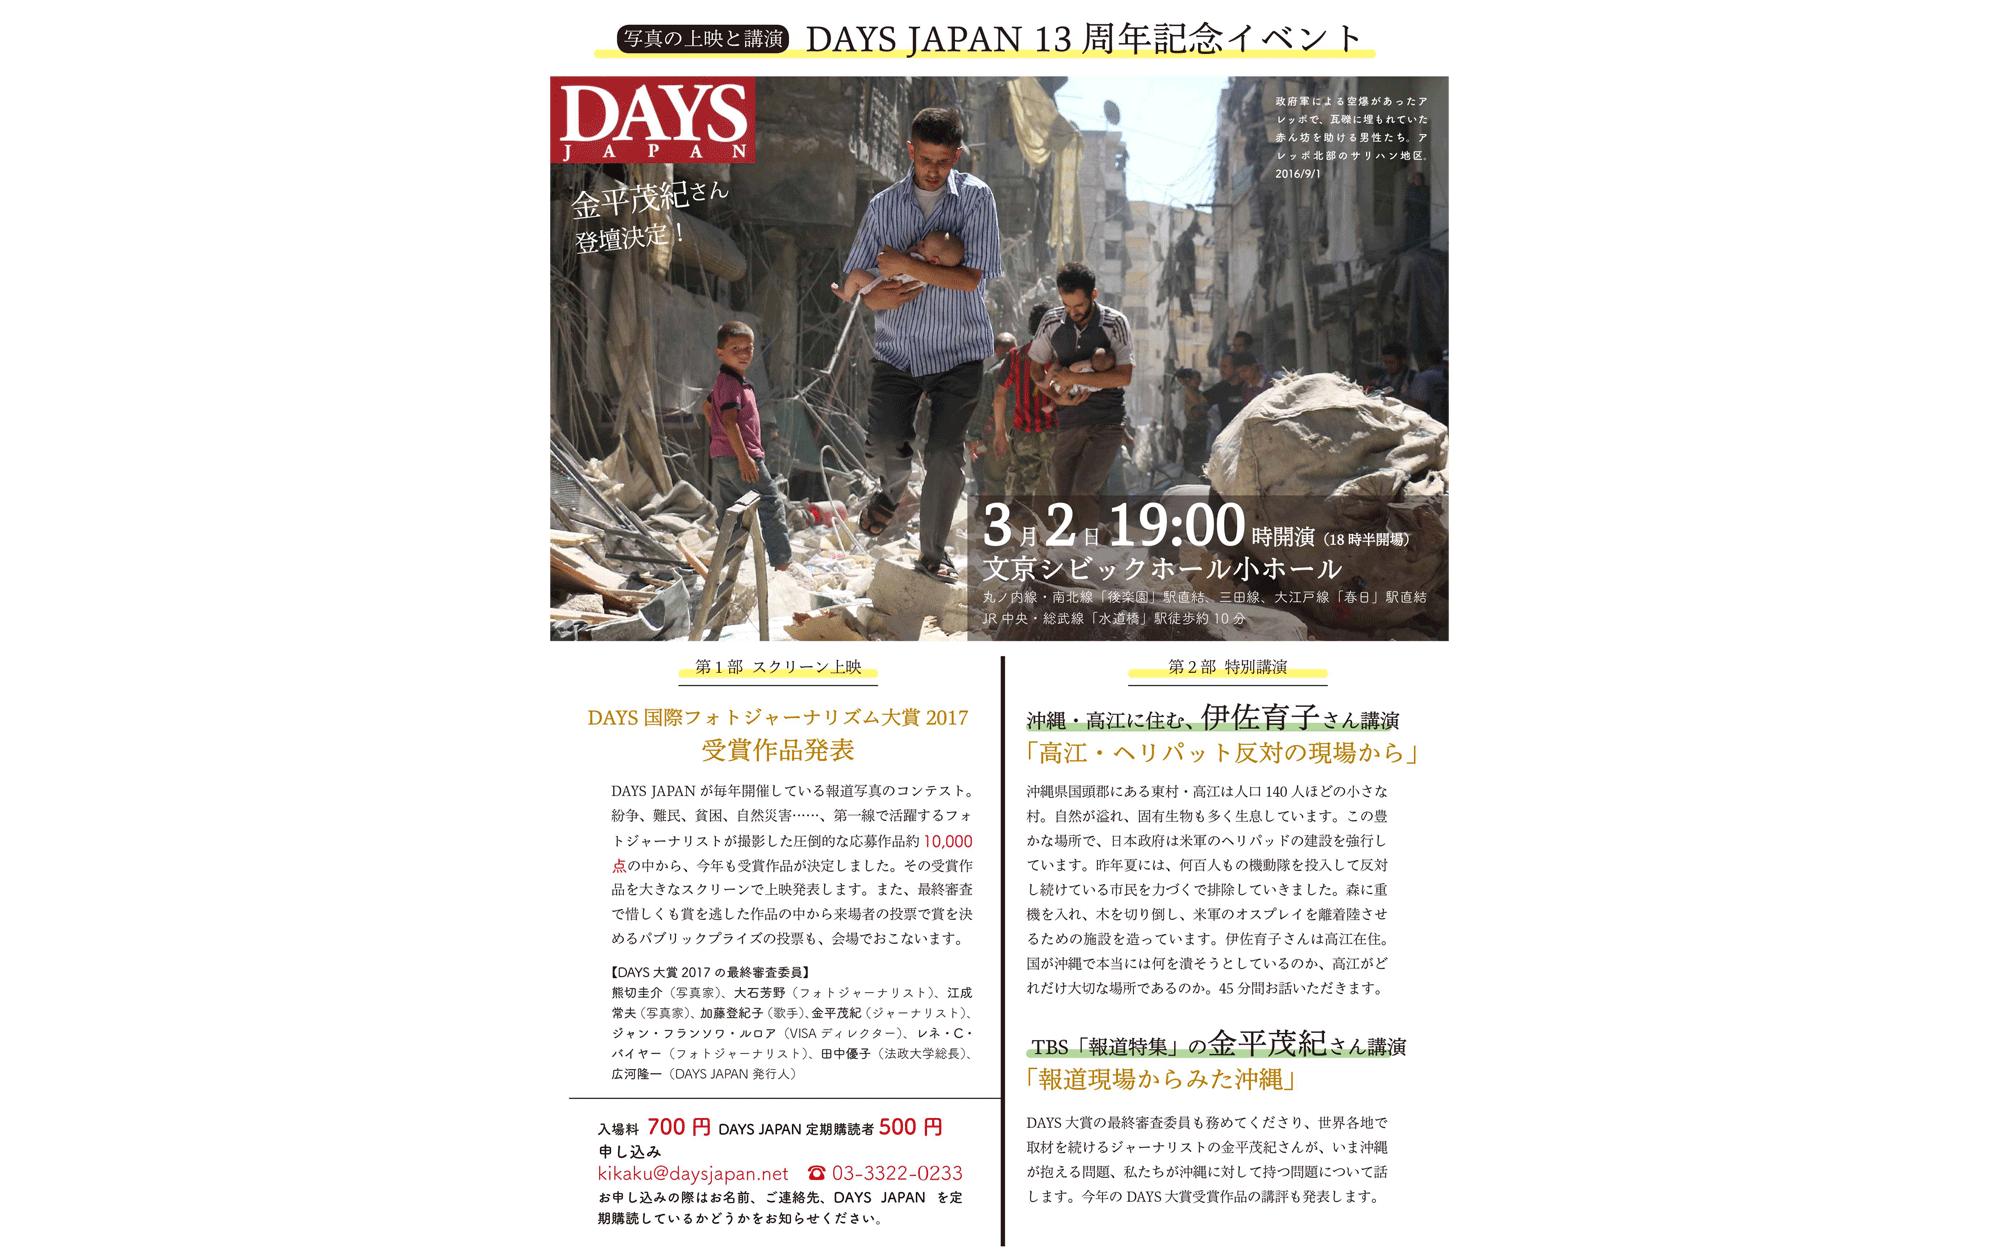 DAYS JAPAN 13周年記念イベント